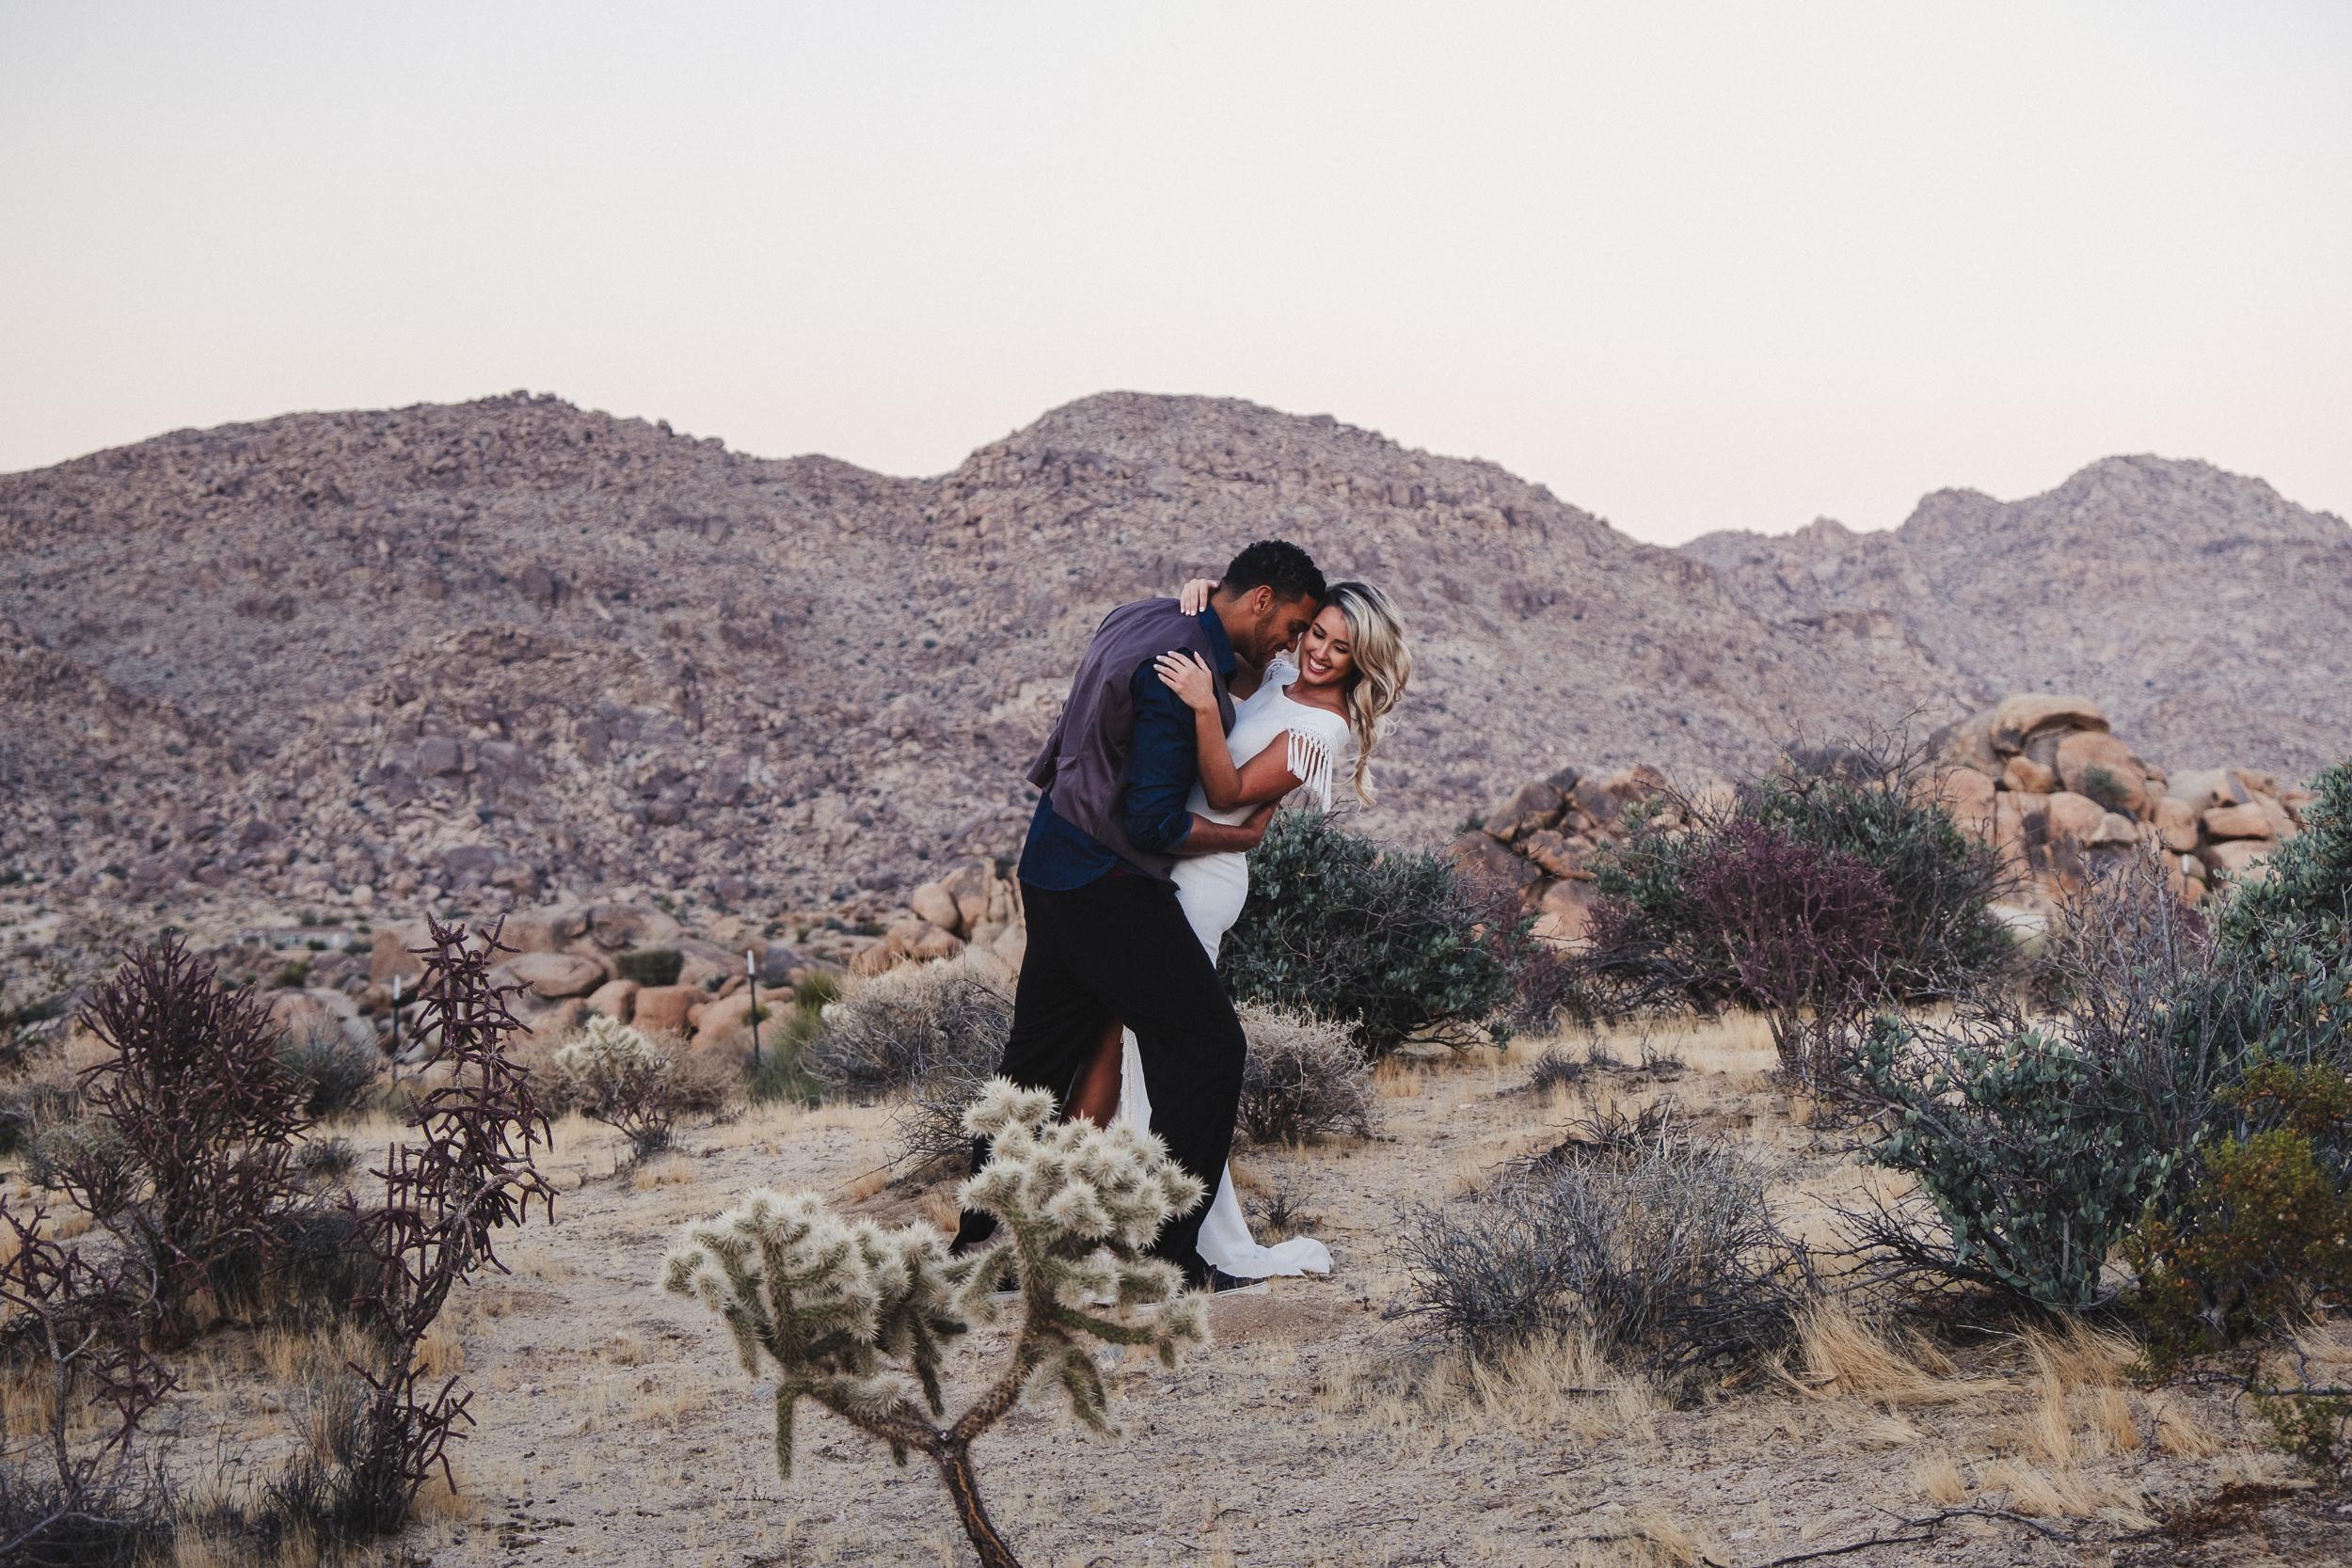 sKarlee + Jamall - Engagement Shoot, Joshua Tree CA-11.jpg